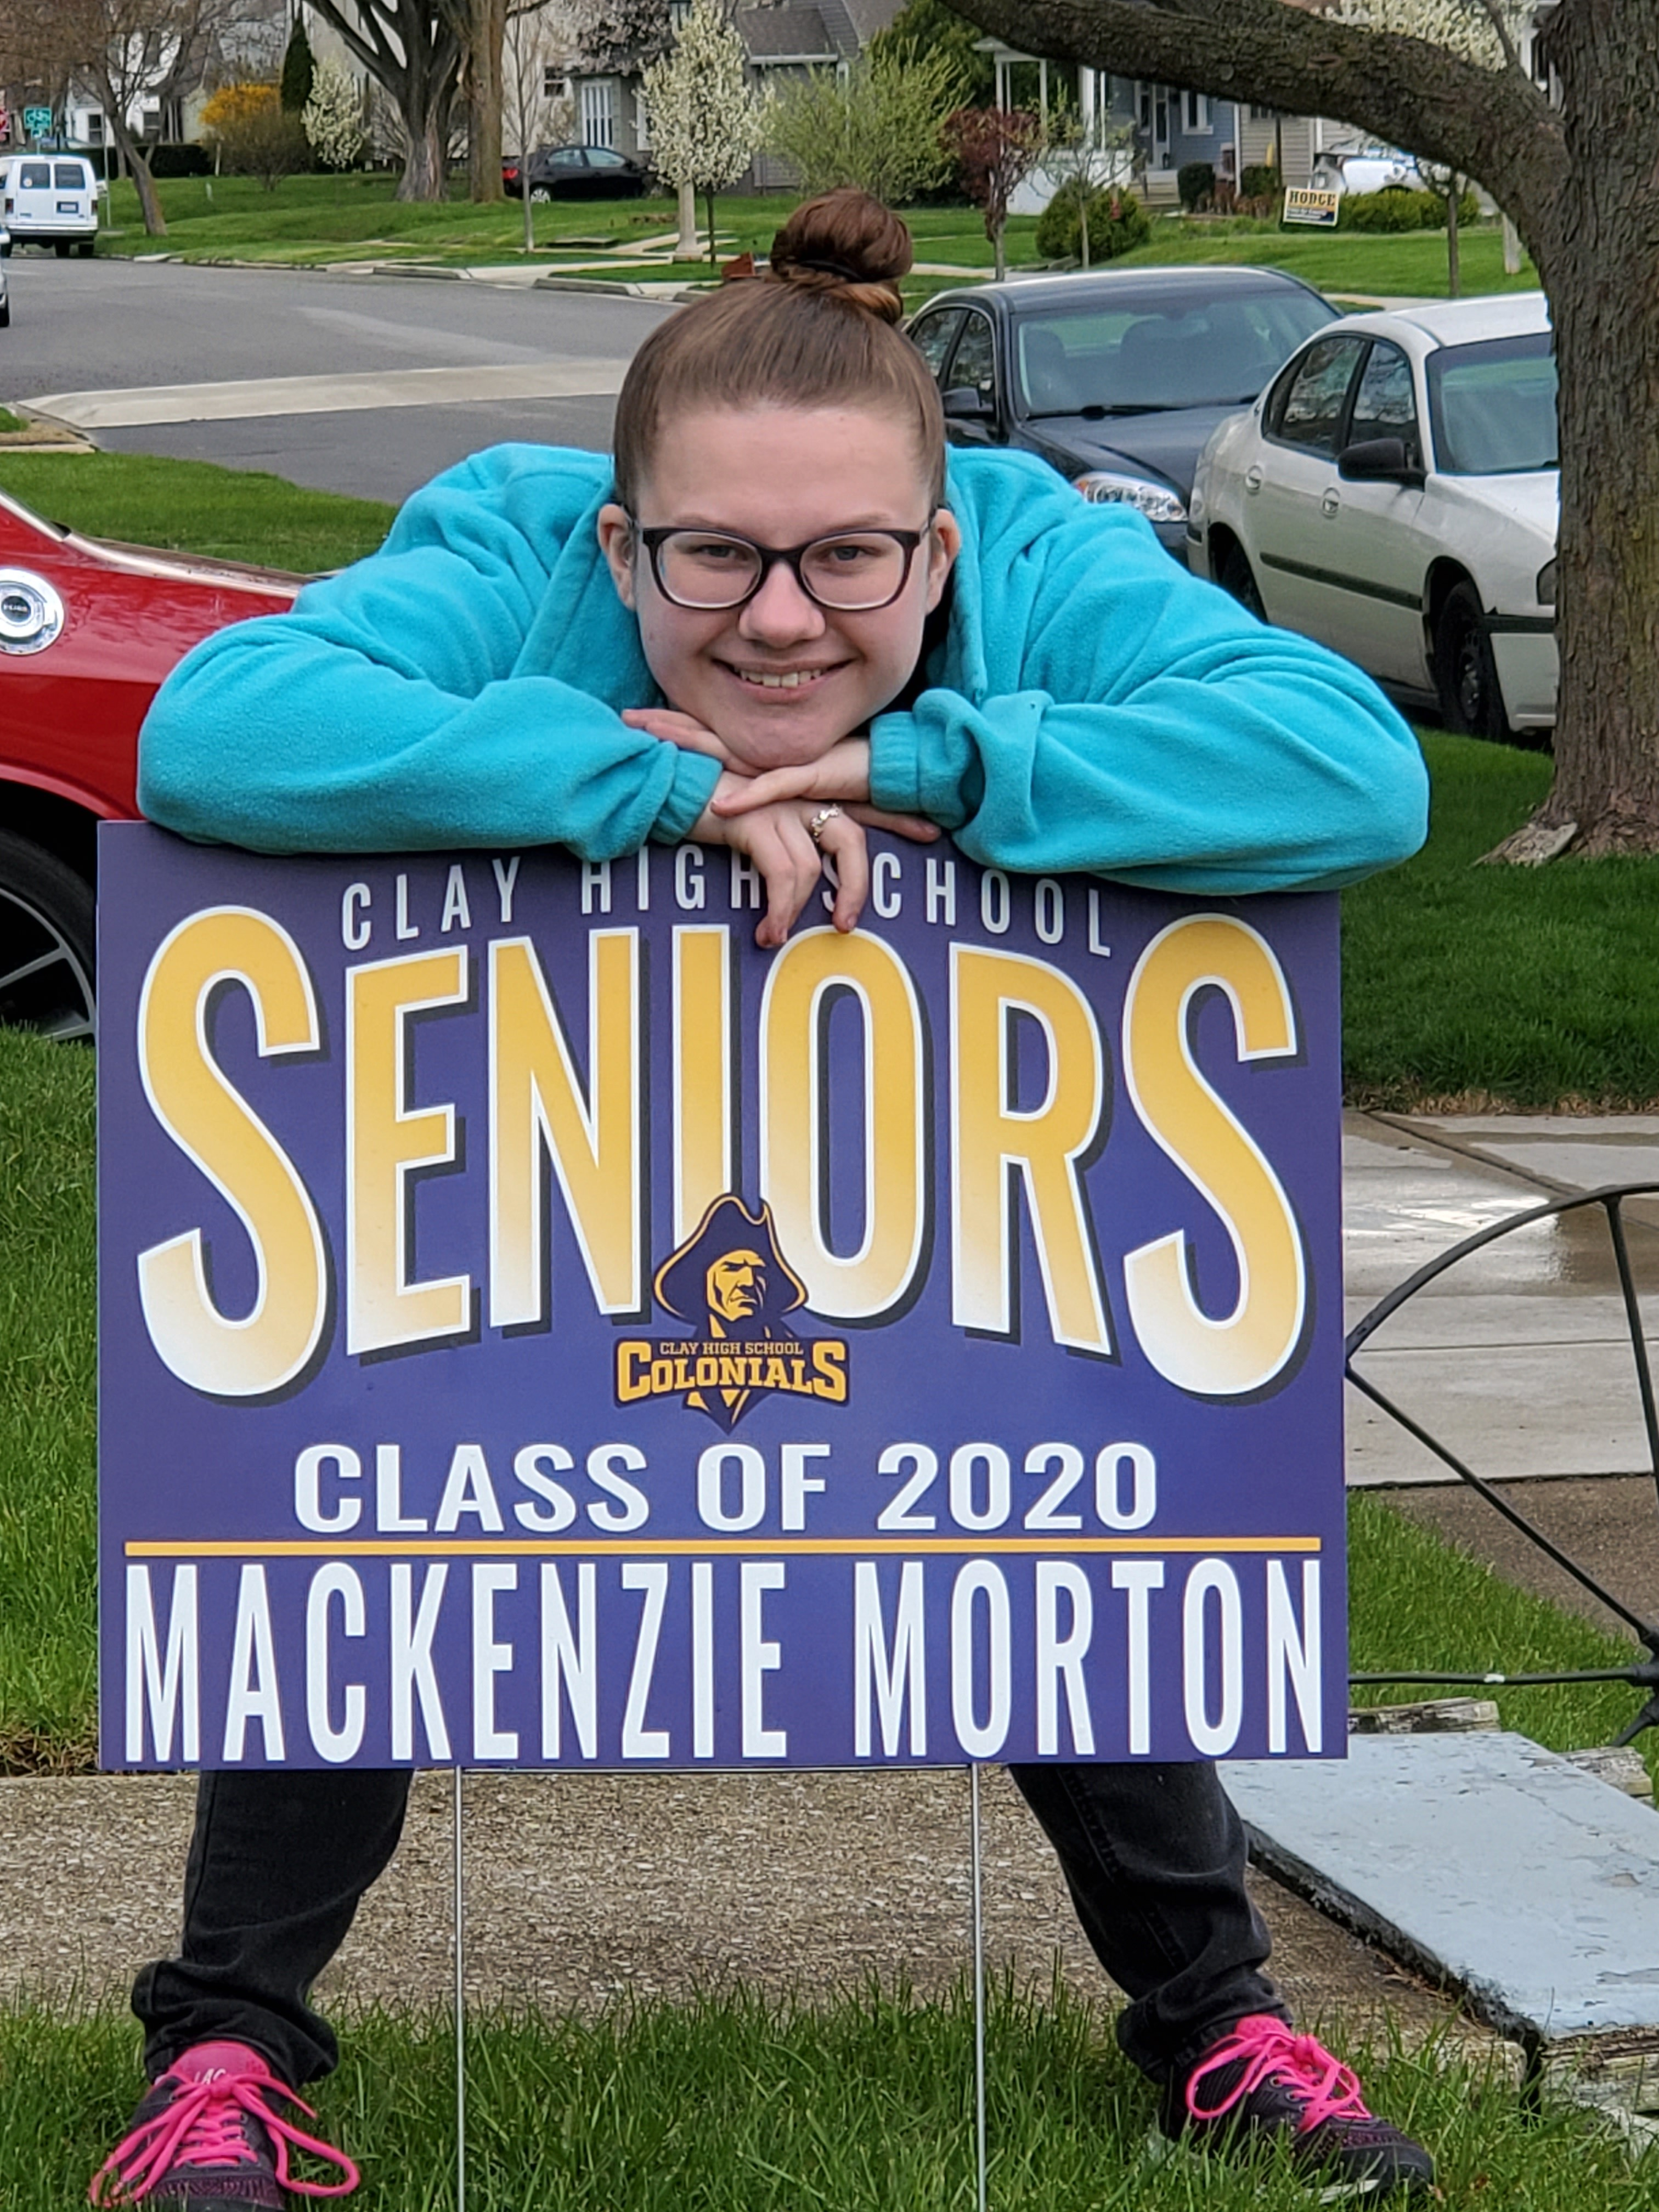 Mackenzie Morton